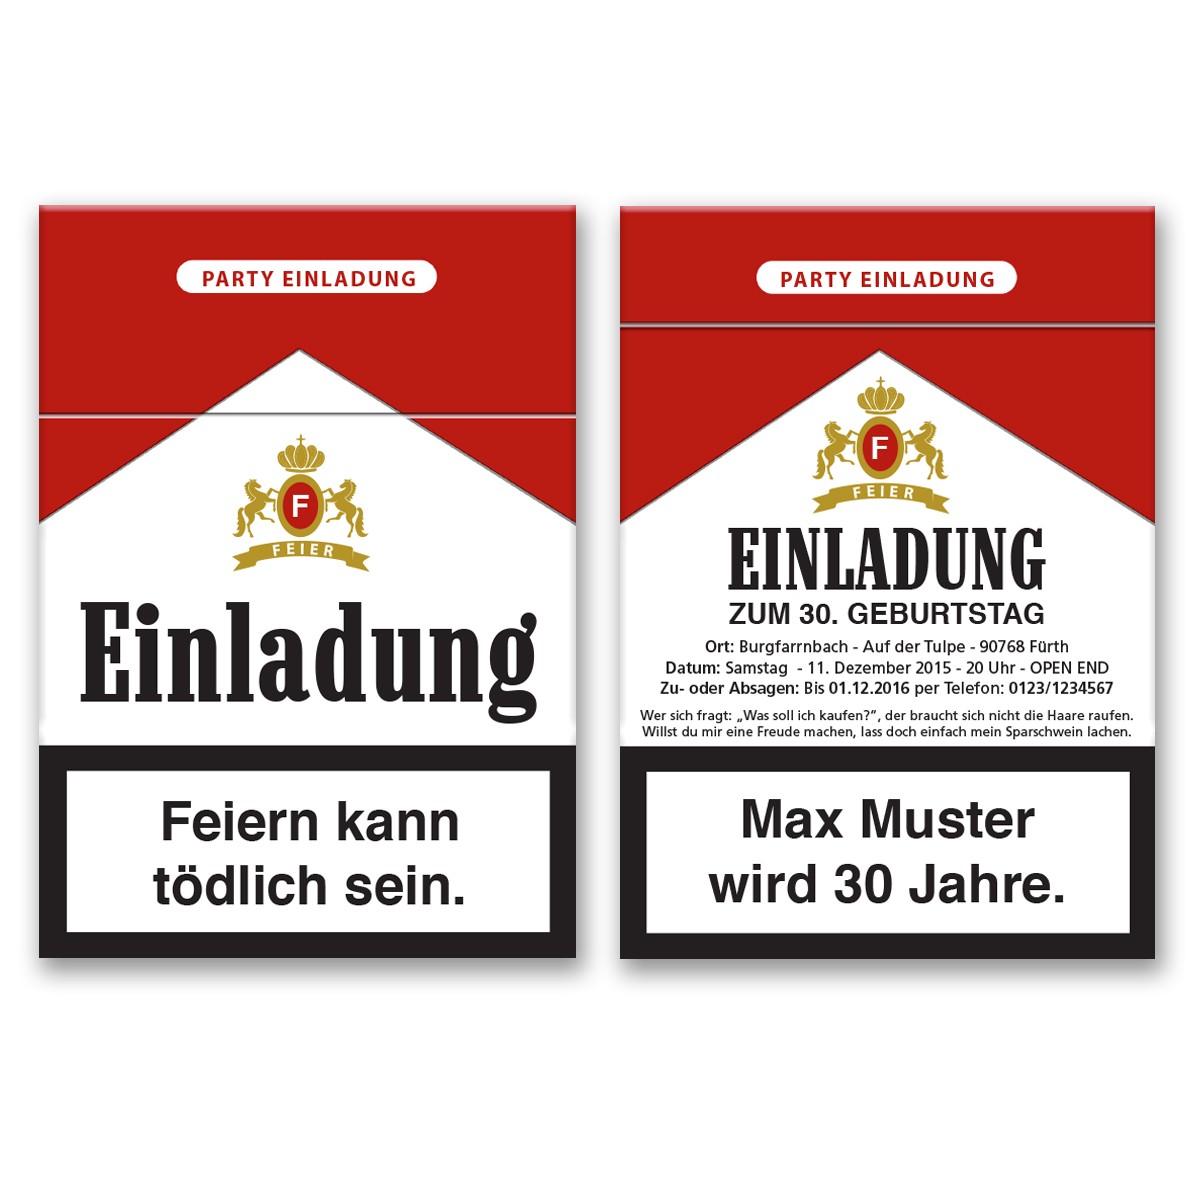 Einladungskarten als Zigarettenschachtel bestellen!